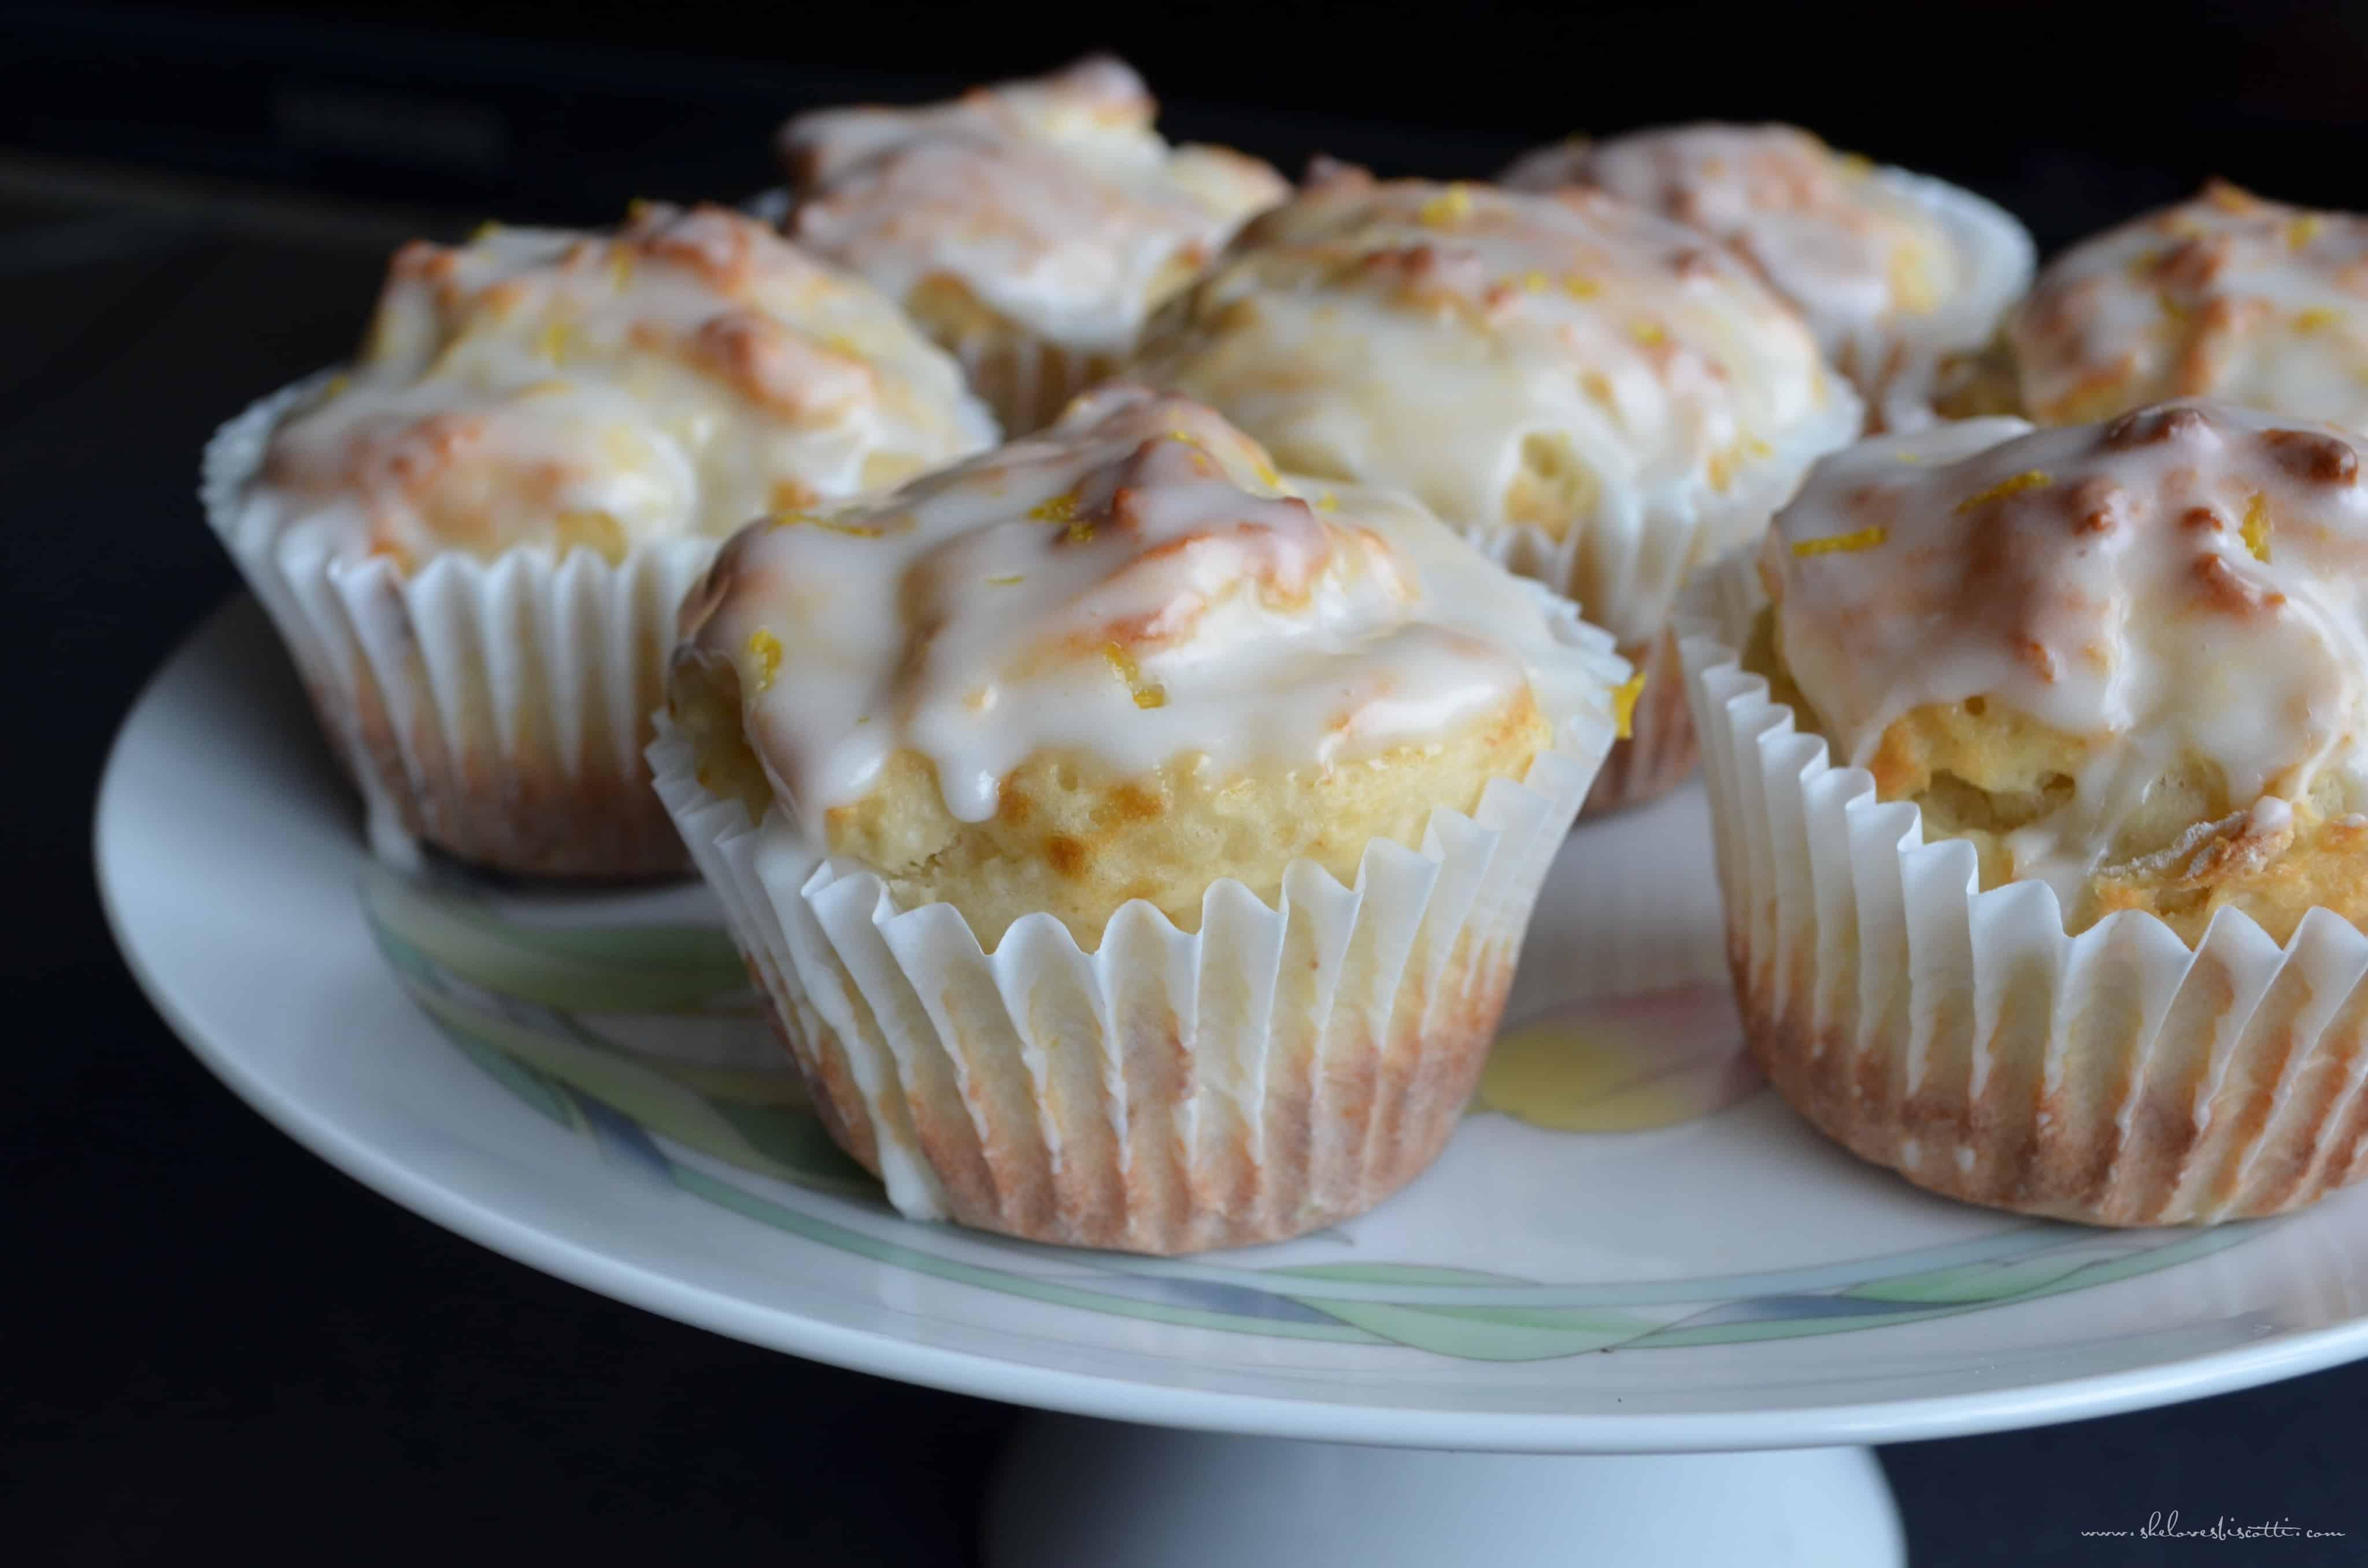 Lemony Greek Yogurt Muffins